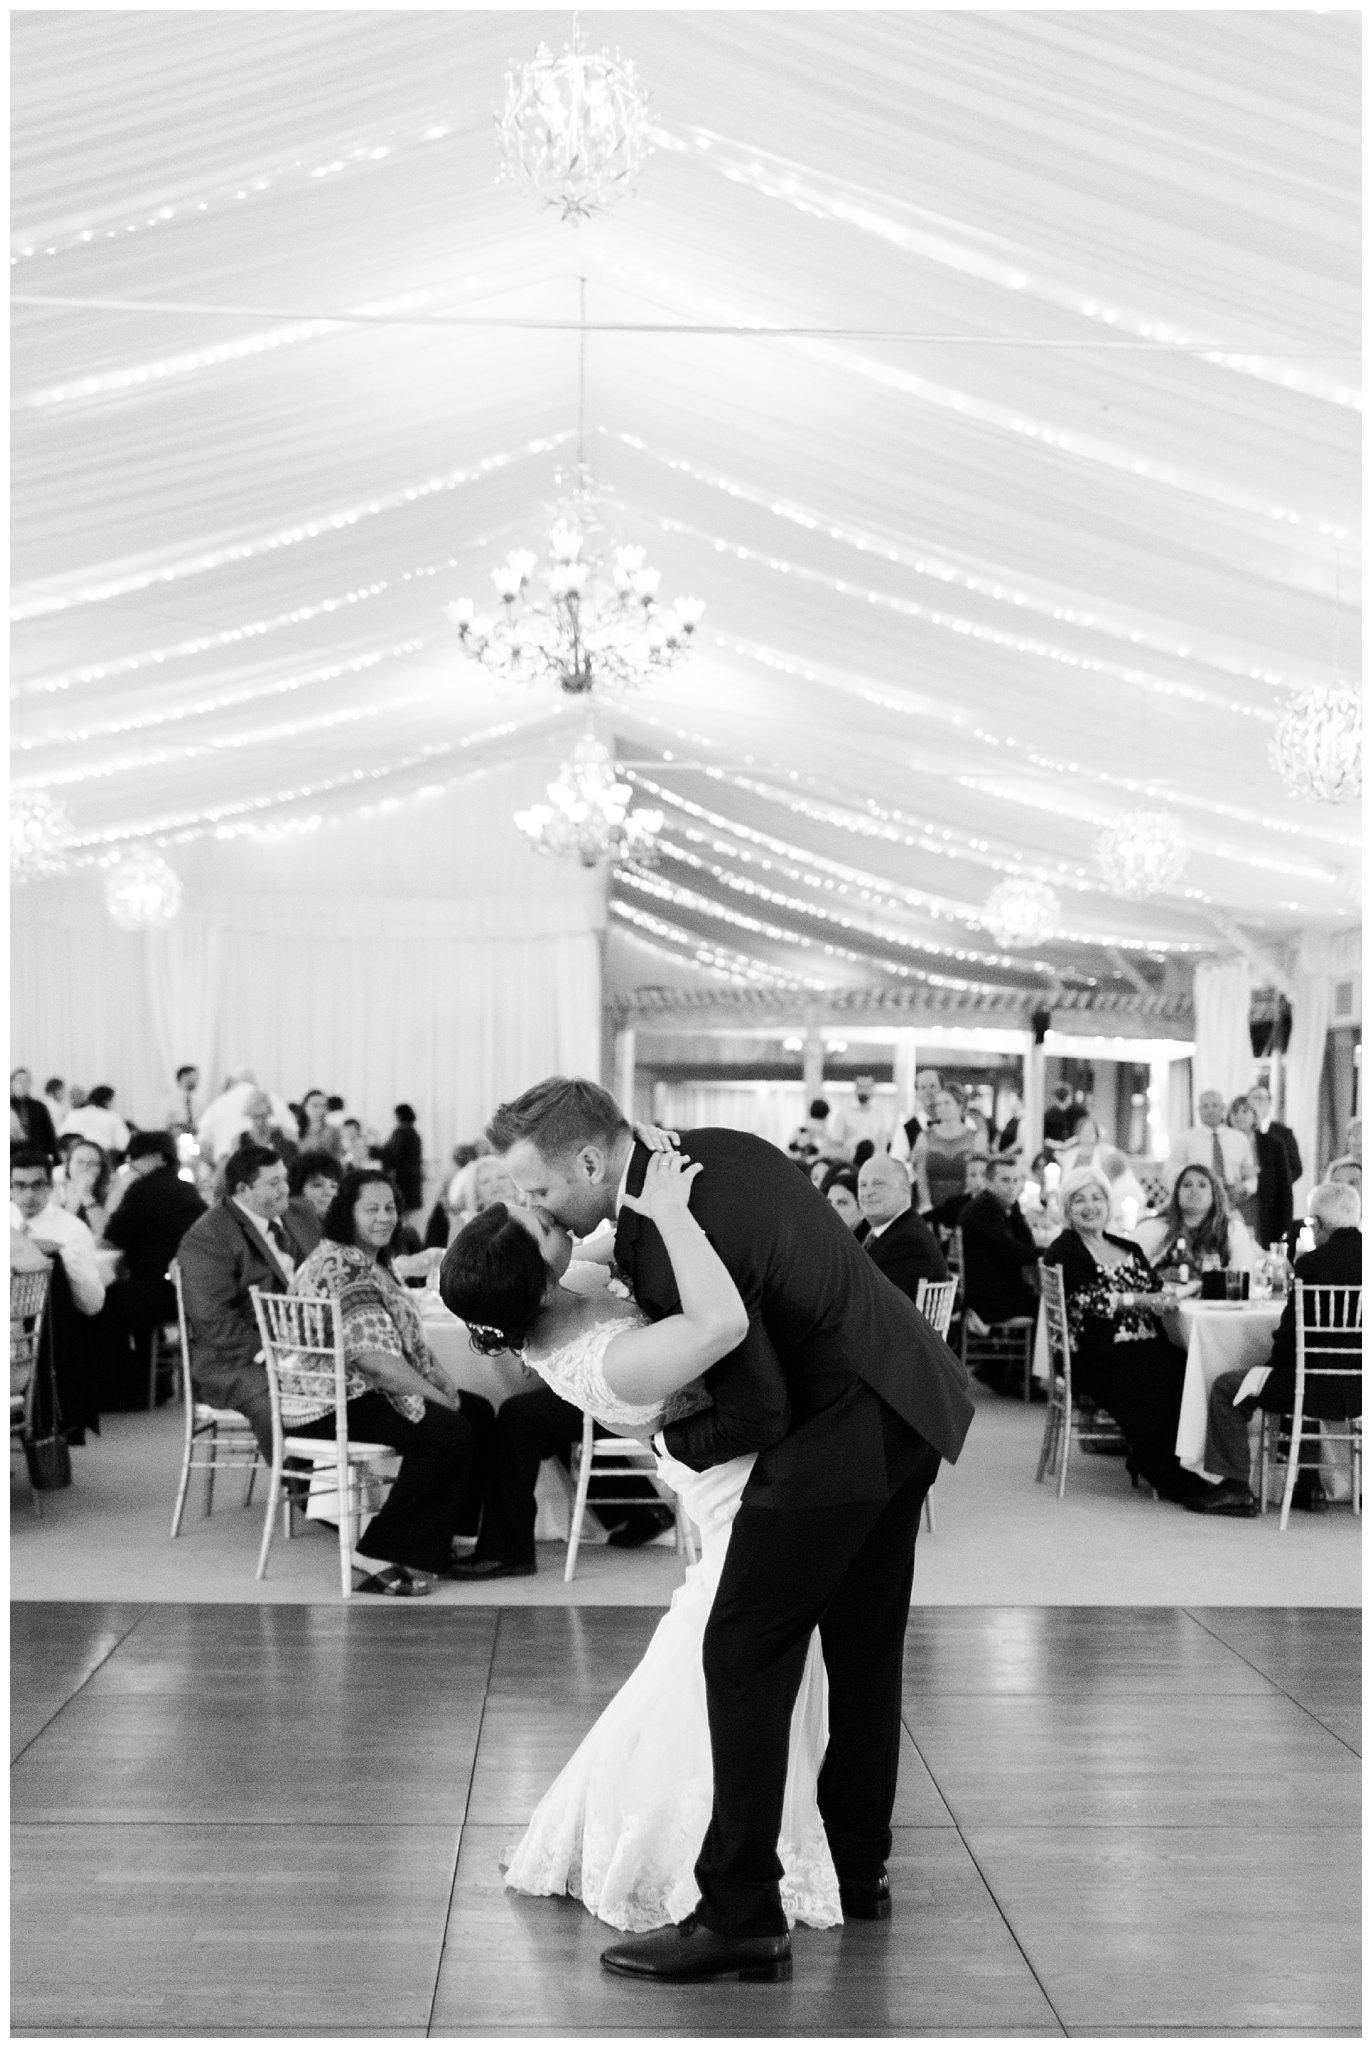 Alicia&Kurt_RavisloeCountryClubWedding_Chicagoweddingphotographer_RebeccaHaleyPhotography_0200.jpg